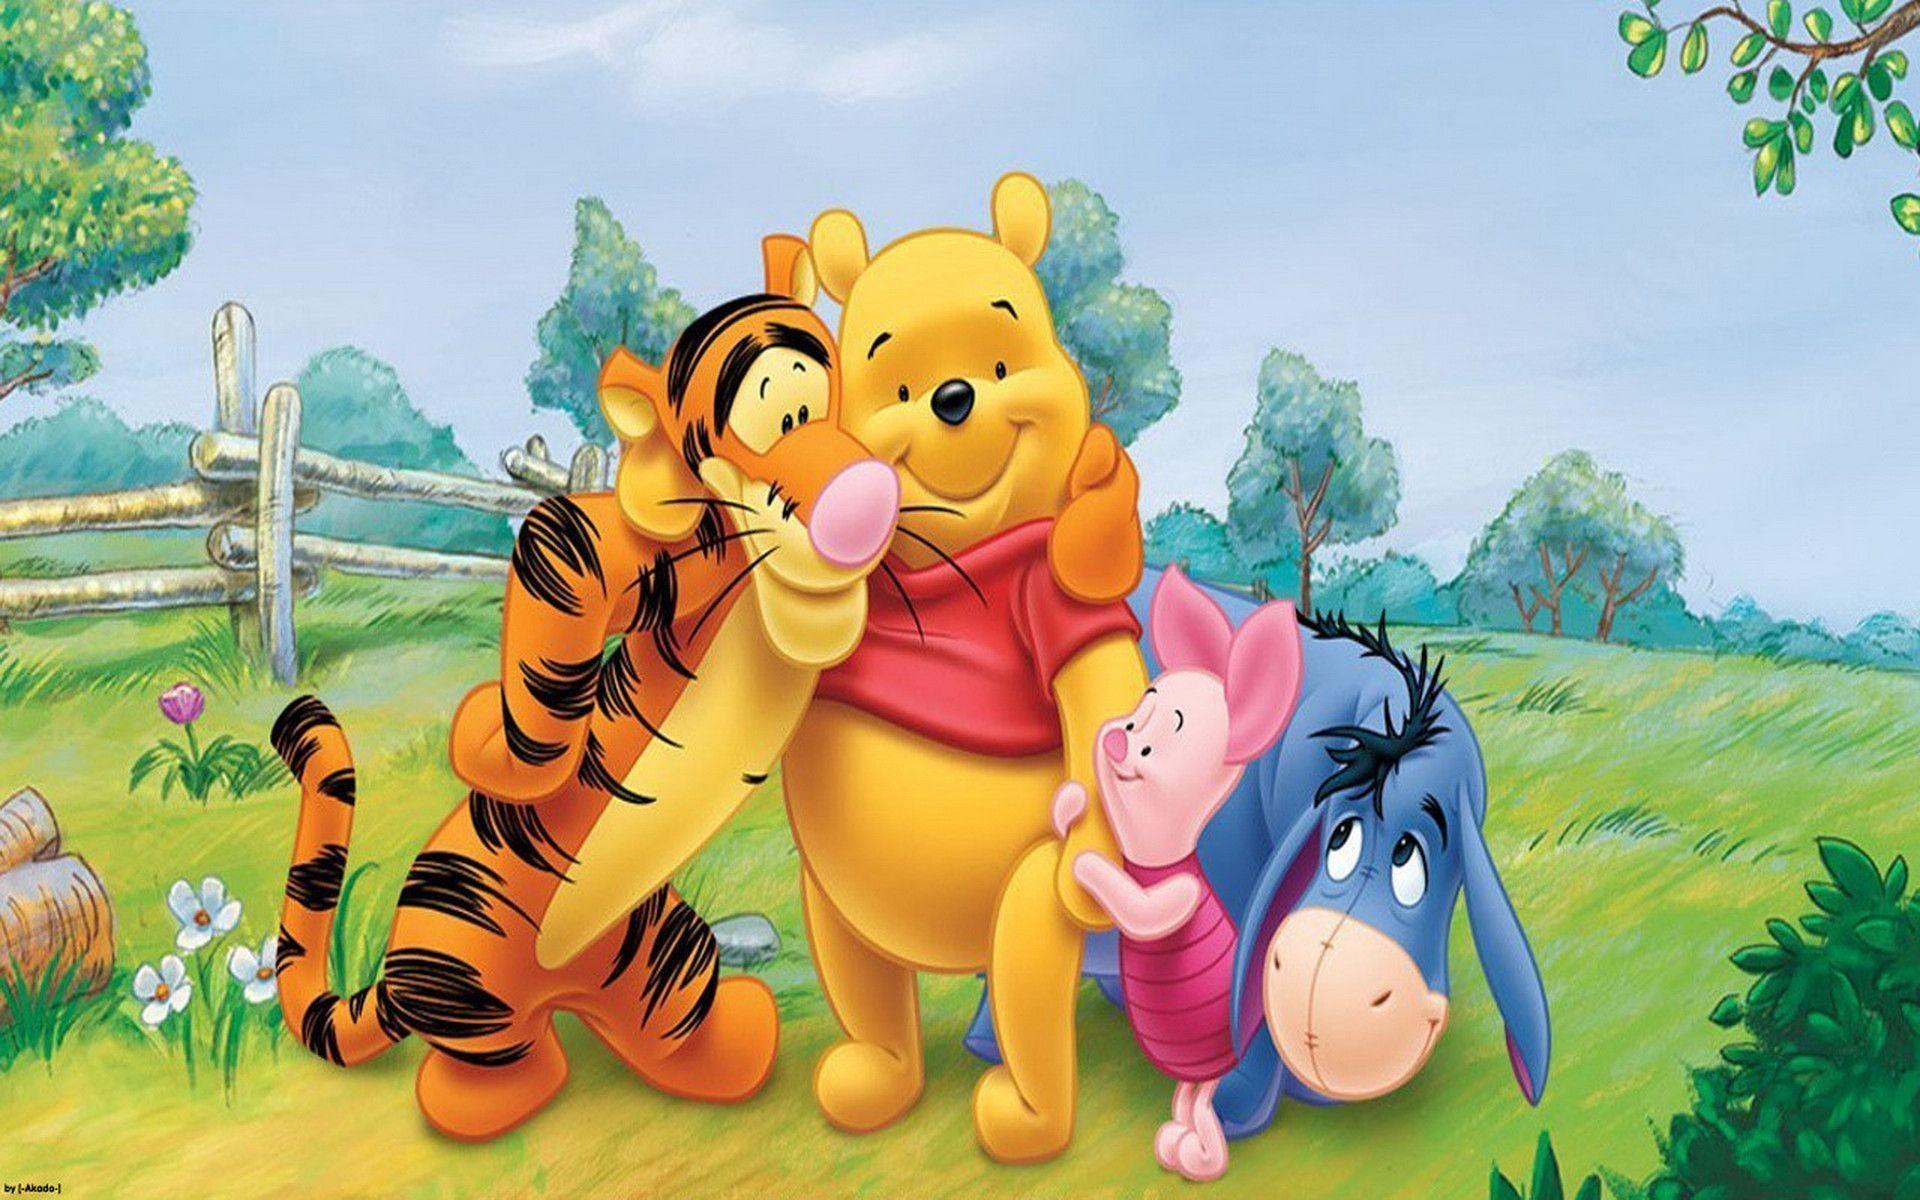 My friends tigger pooh wallpapers 1920x1200 winnie the pooh screensavers wallpaper hd download altavistaventures Images